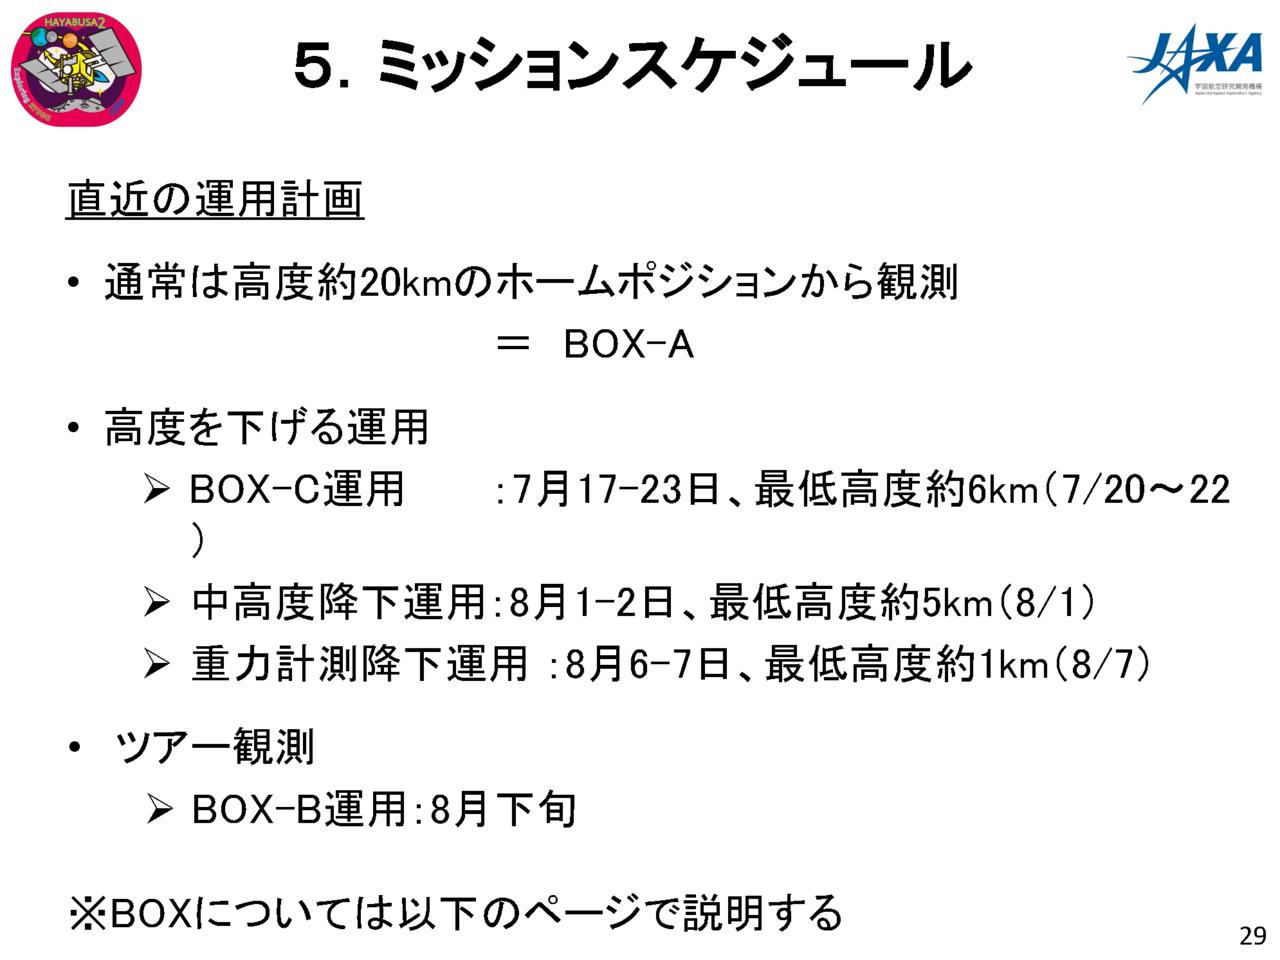 f:id:Imamura:20180719131724p:plain